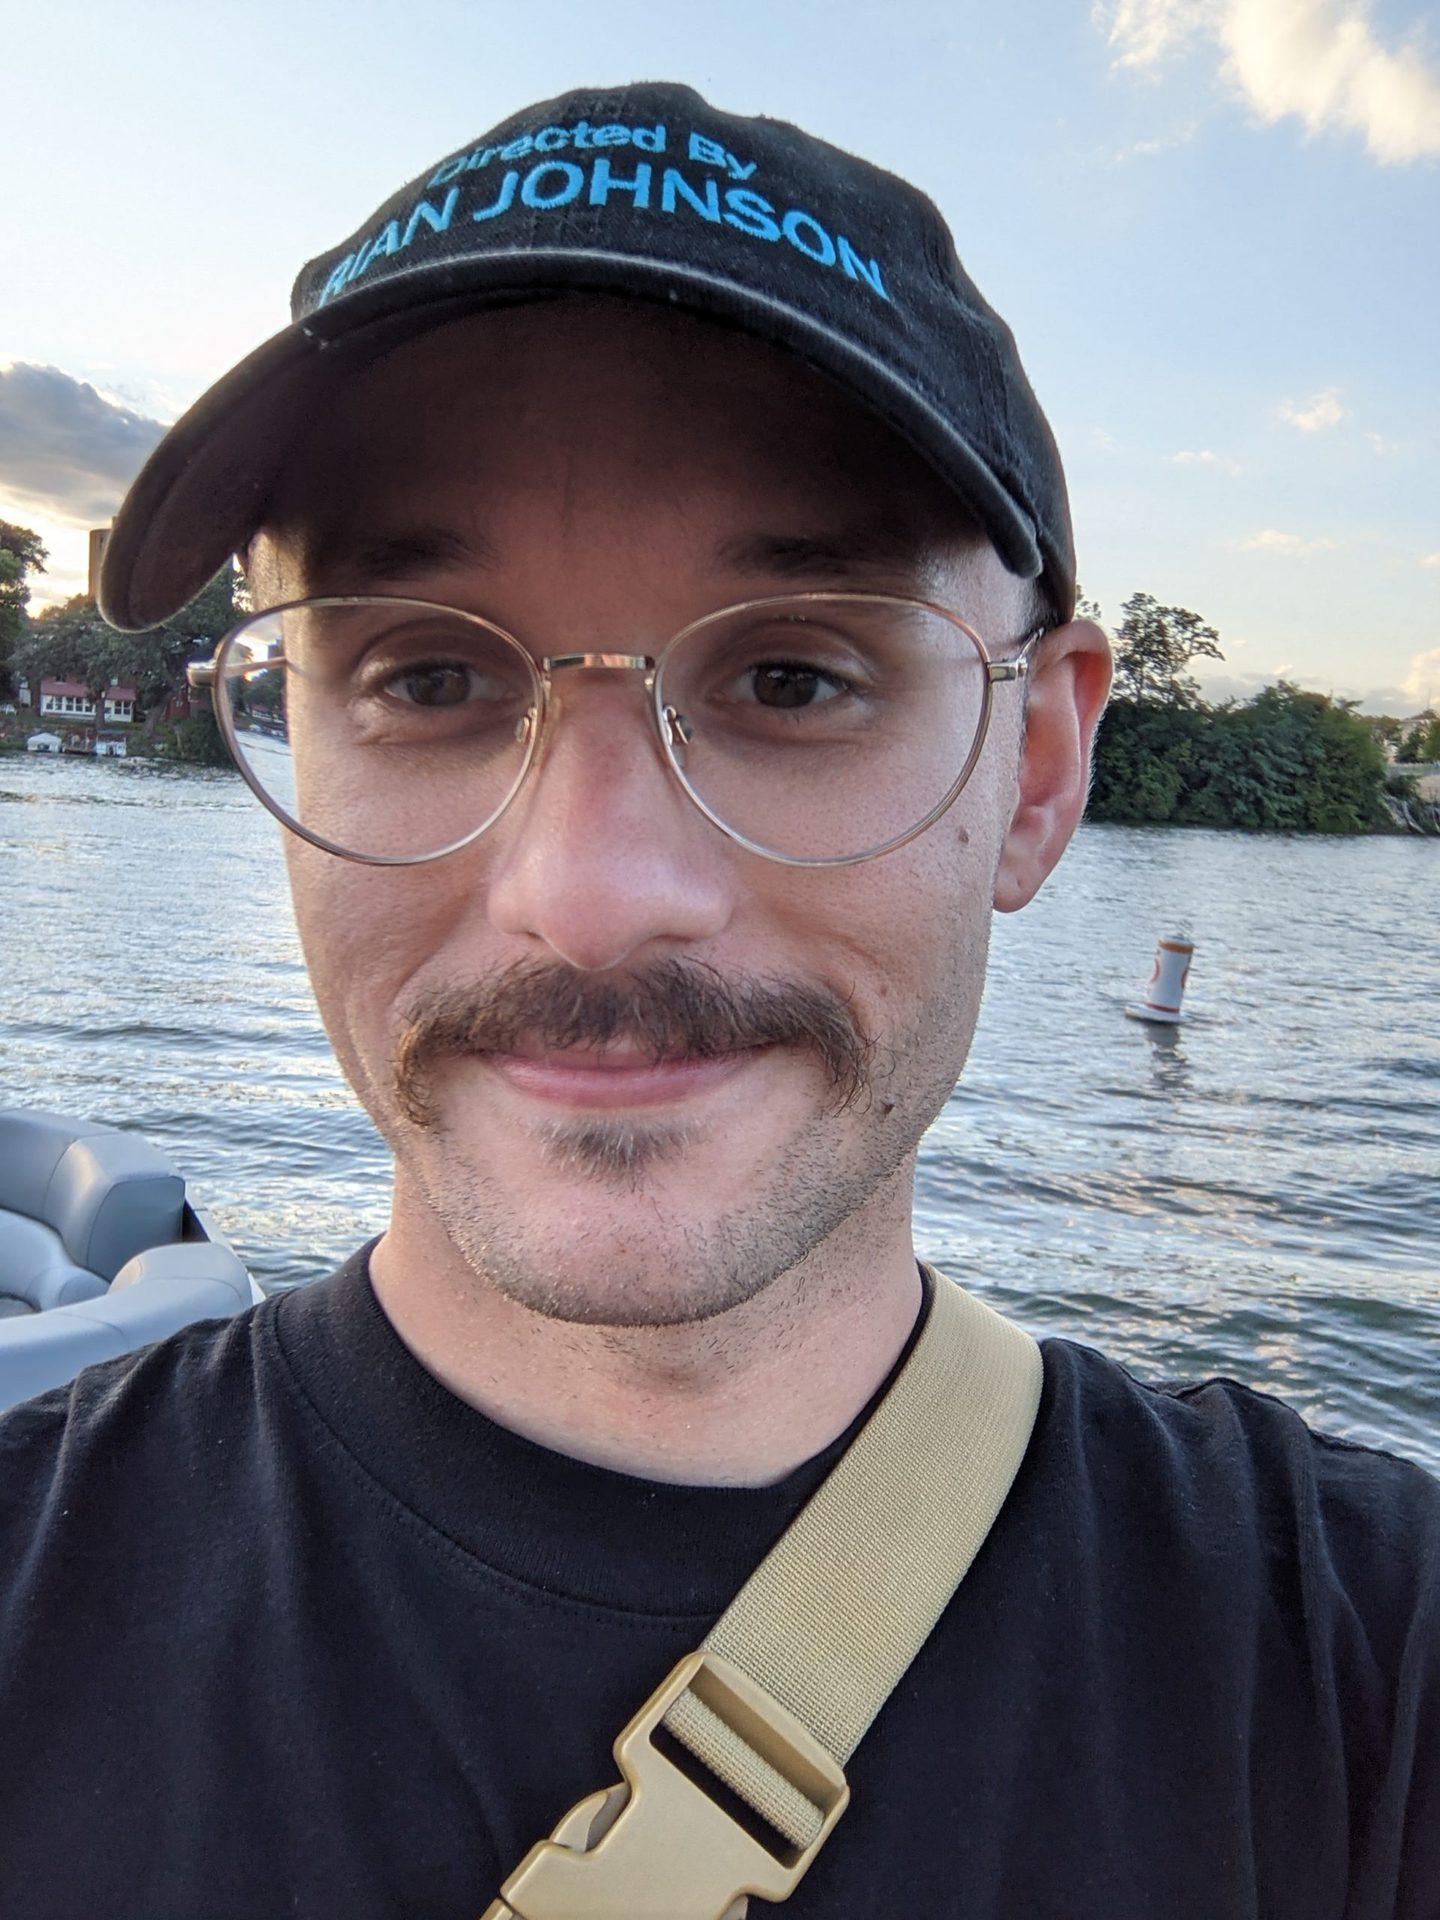 Google Pixel 5a camera sample selfie on river at 1.4x